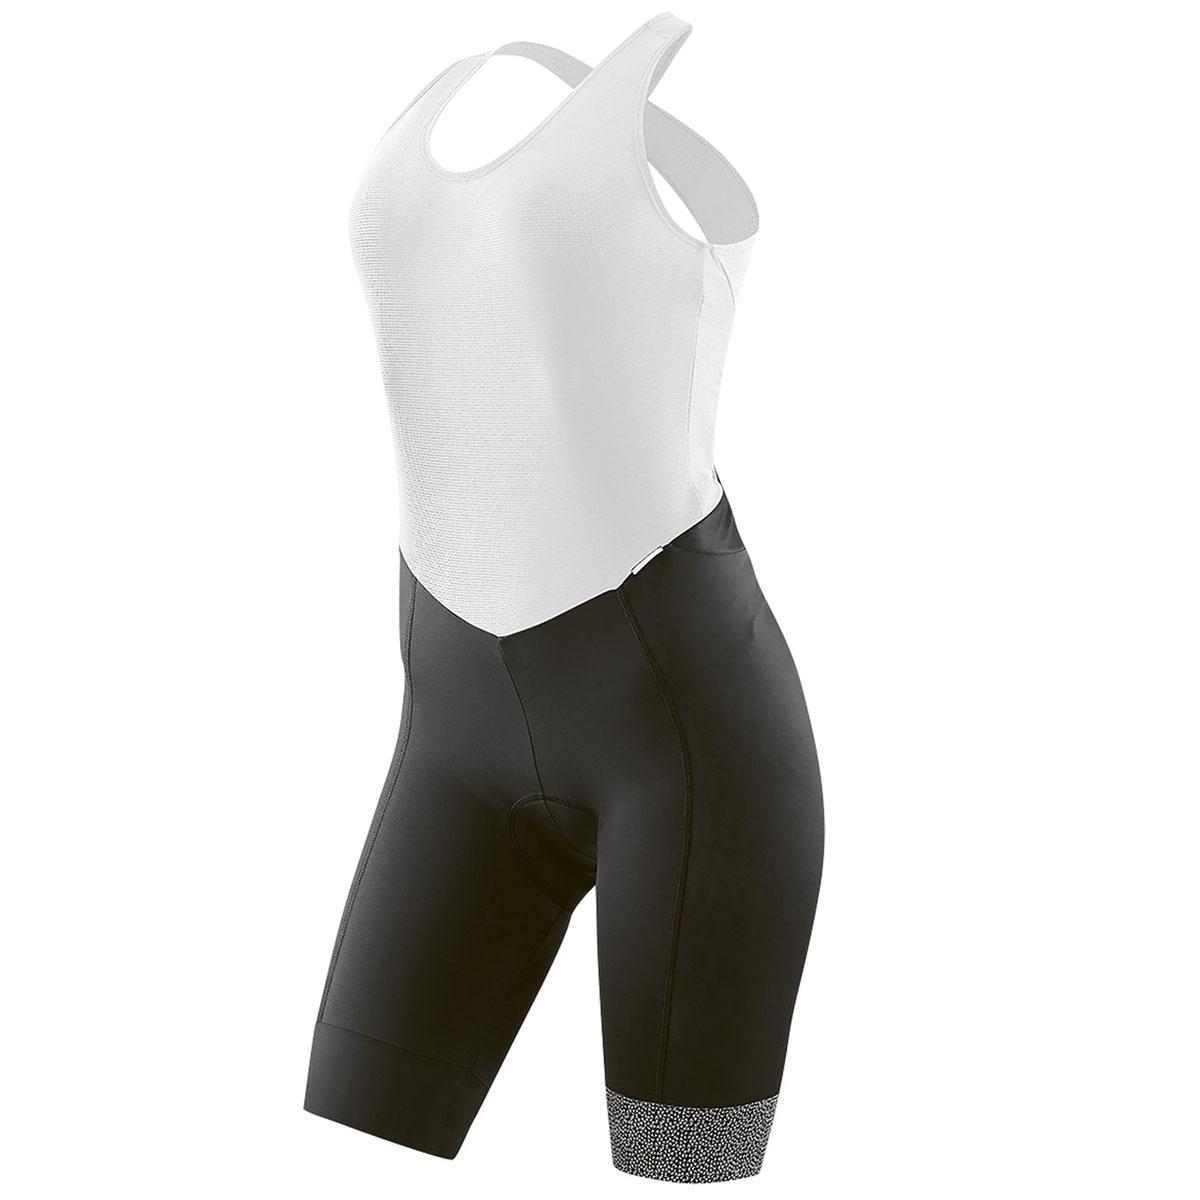 Gonso Montebelluna Women's Bib Shorts - Black